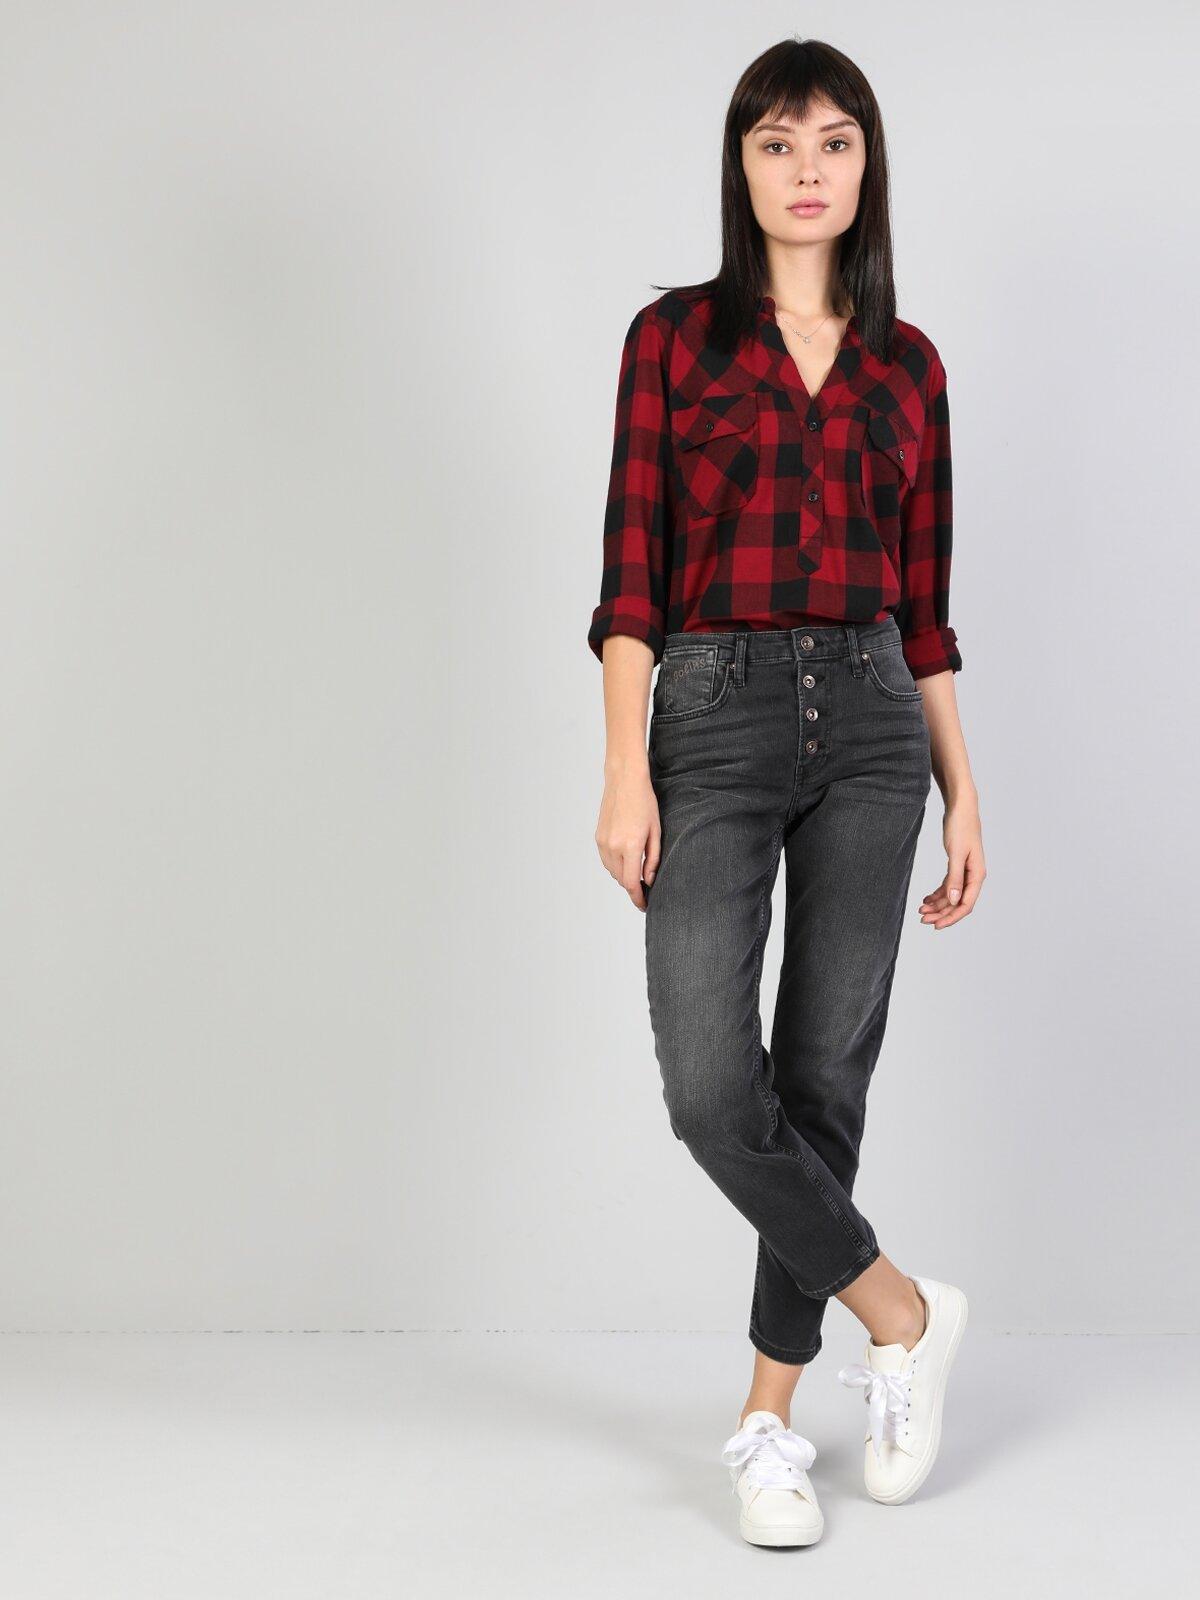 891 Maya Orta Bel Daralan Paça Slim Fit Gri Kadın Jean Pantolon